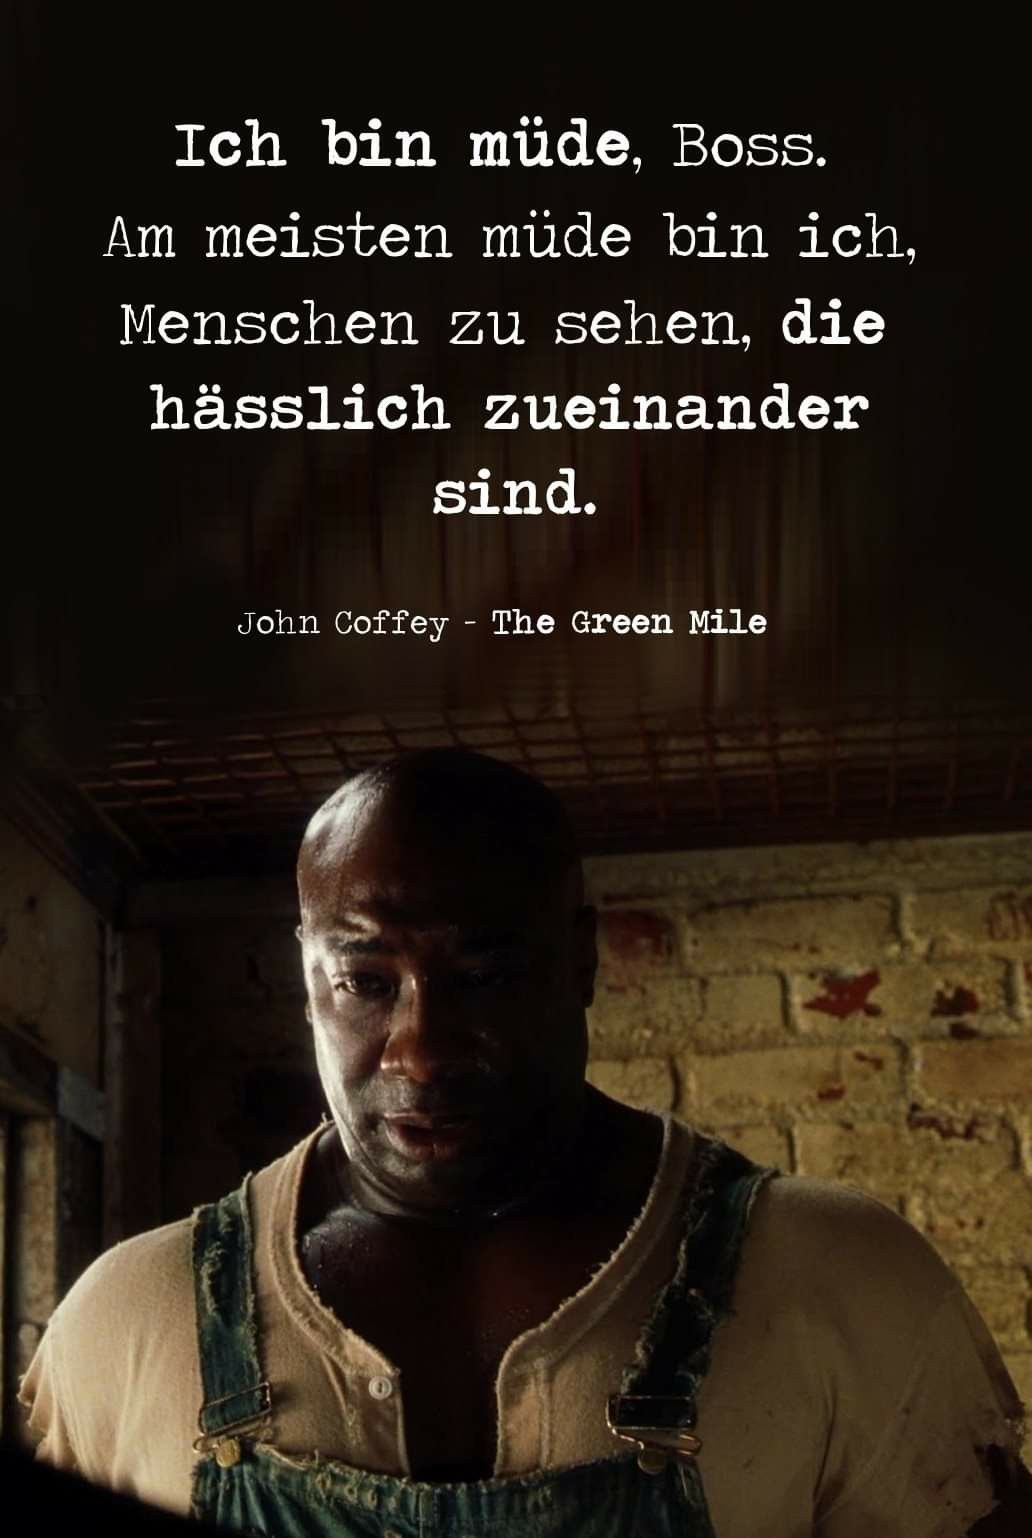 The Green Mile - John Coffey